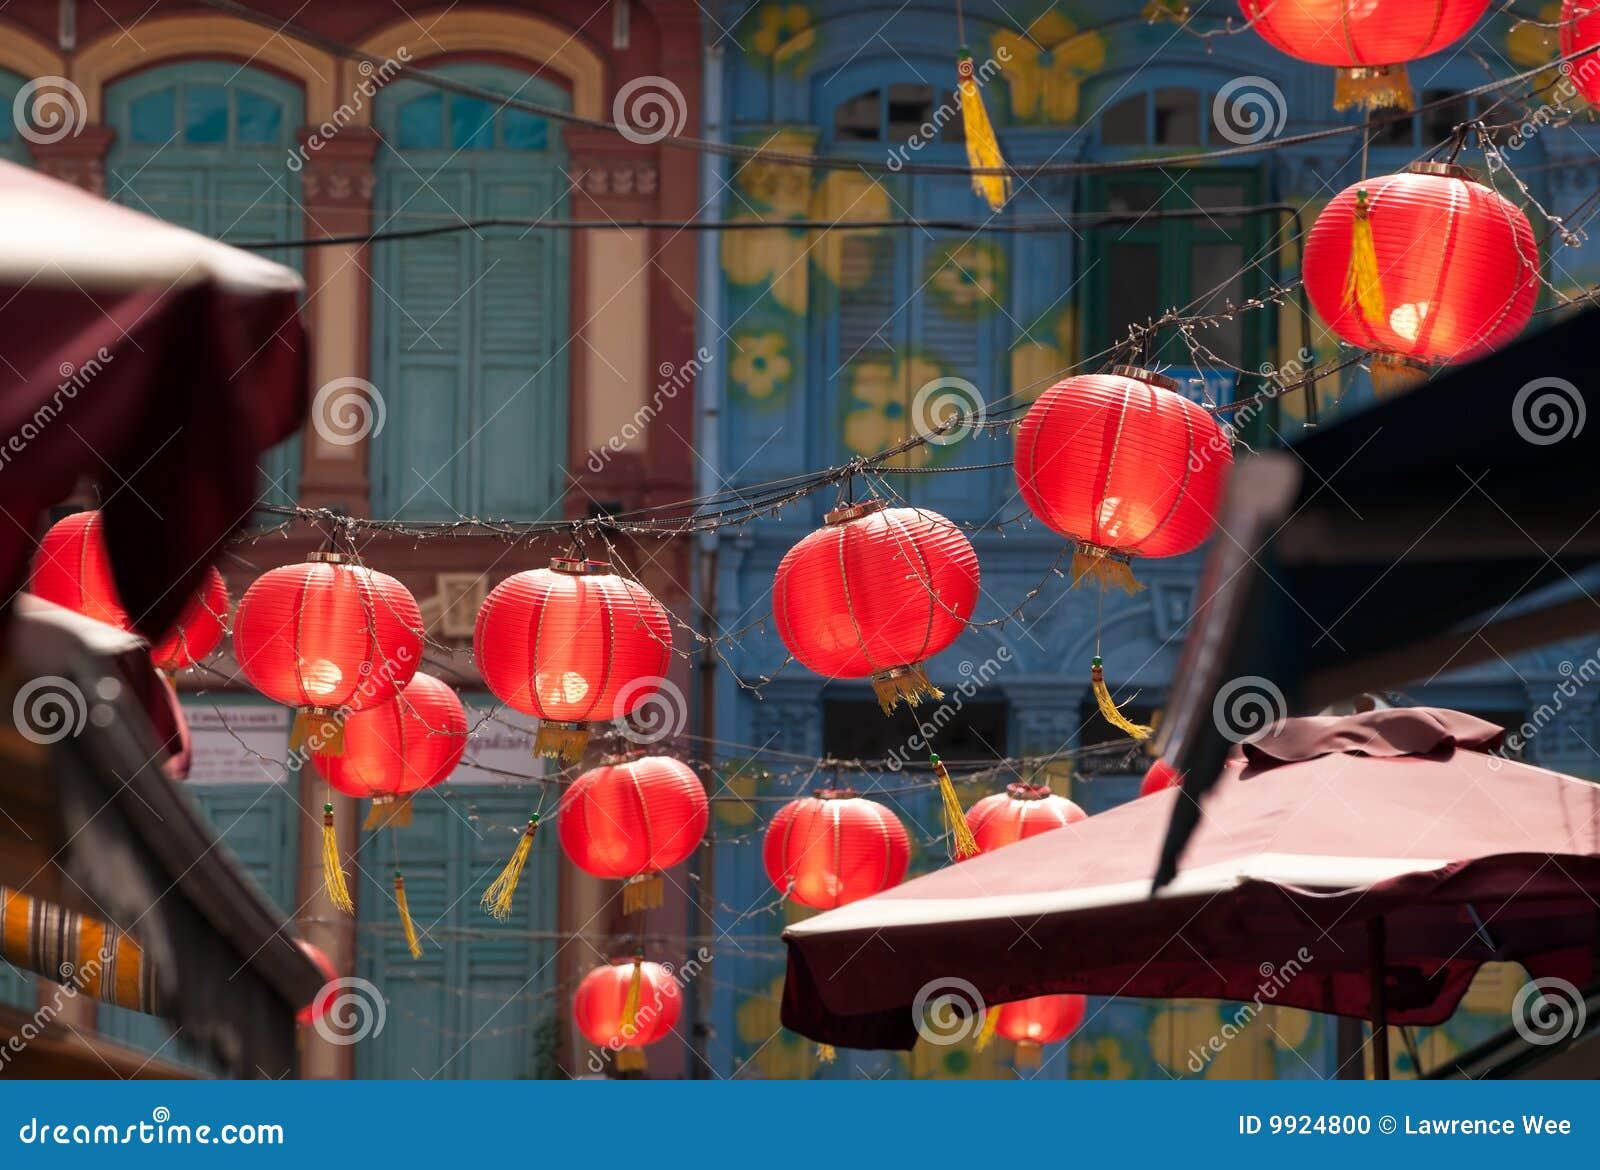 rote laternen in chinatown stockfoto bild 9924800. Black Bedroom Furniture Sets. Home Design Ideas